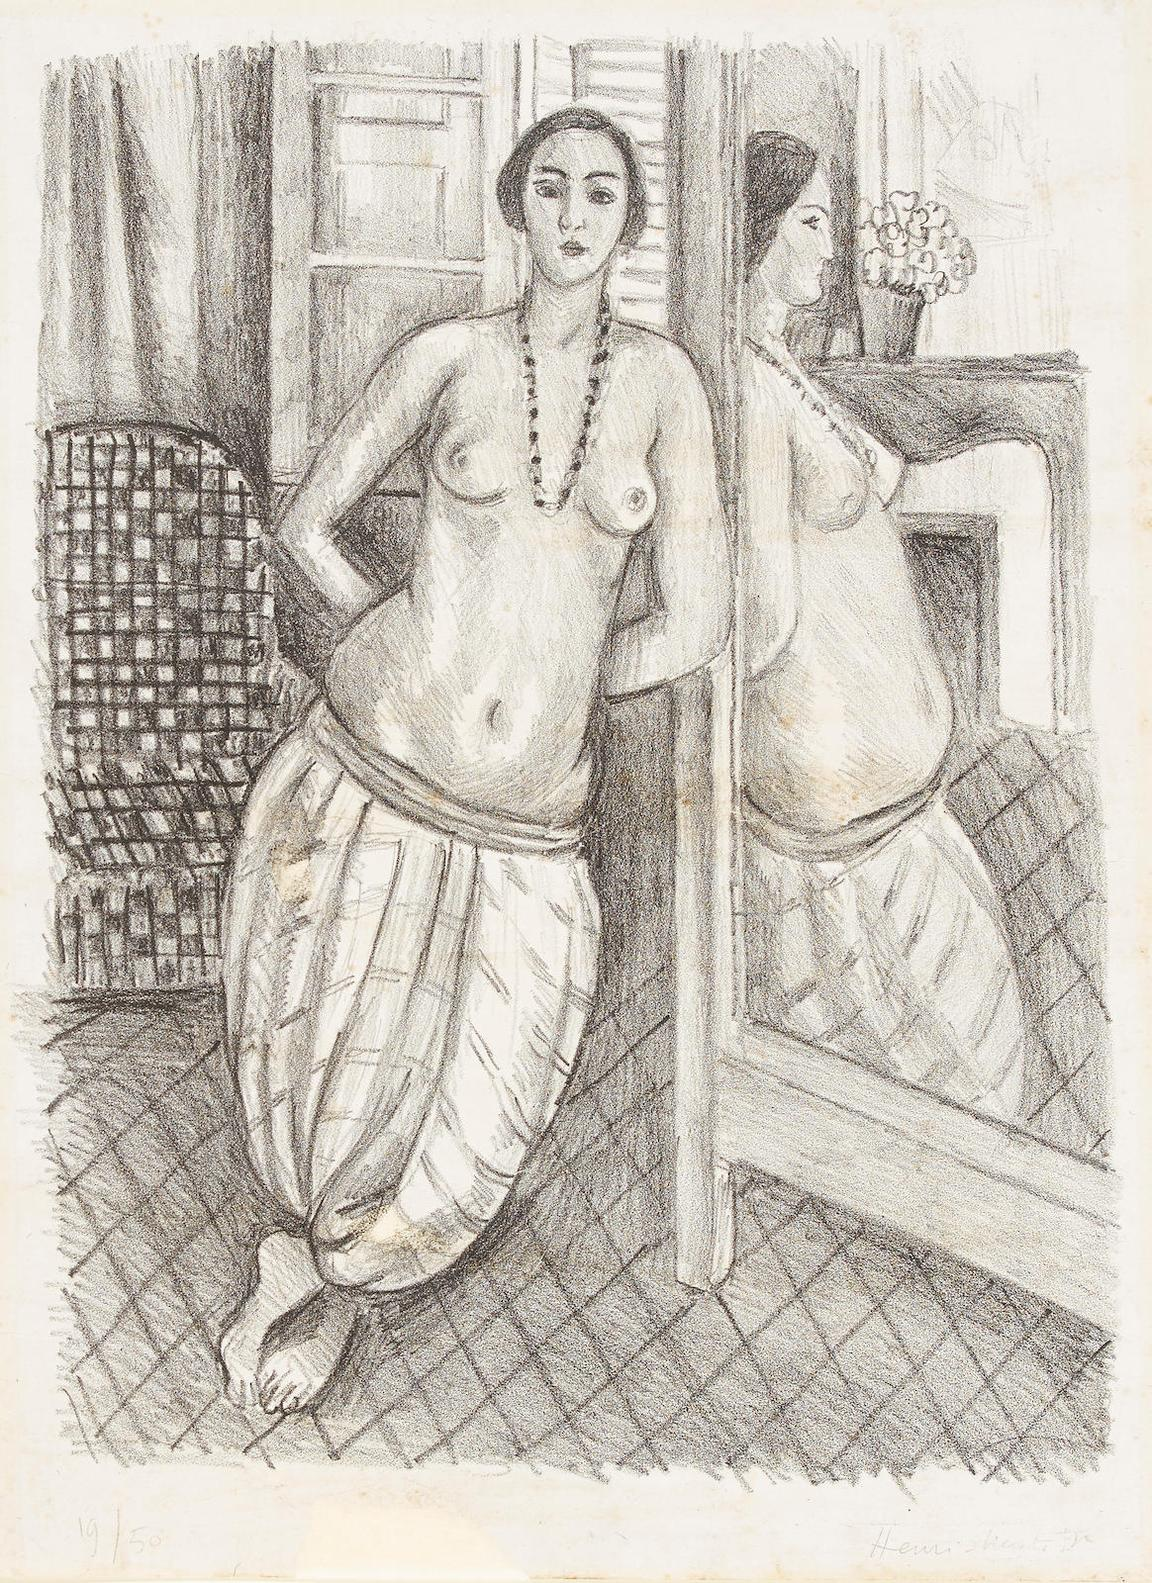 Henri Matisse-Odalisque A La Culotte Rayee, Refletee Dans La Glace-1923